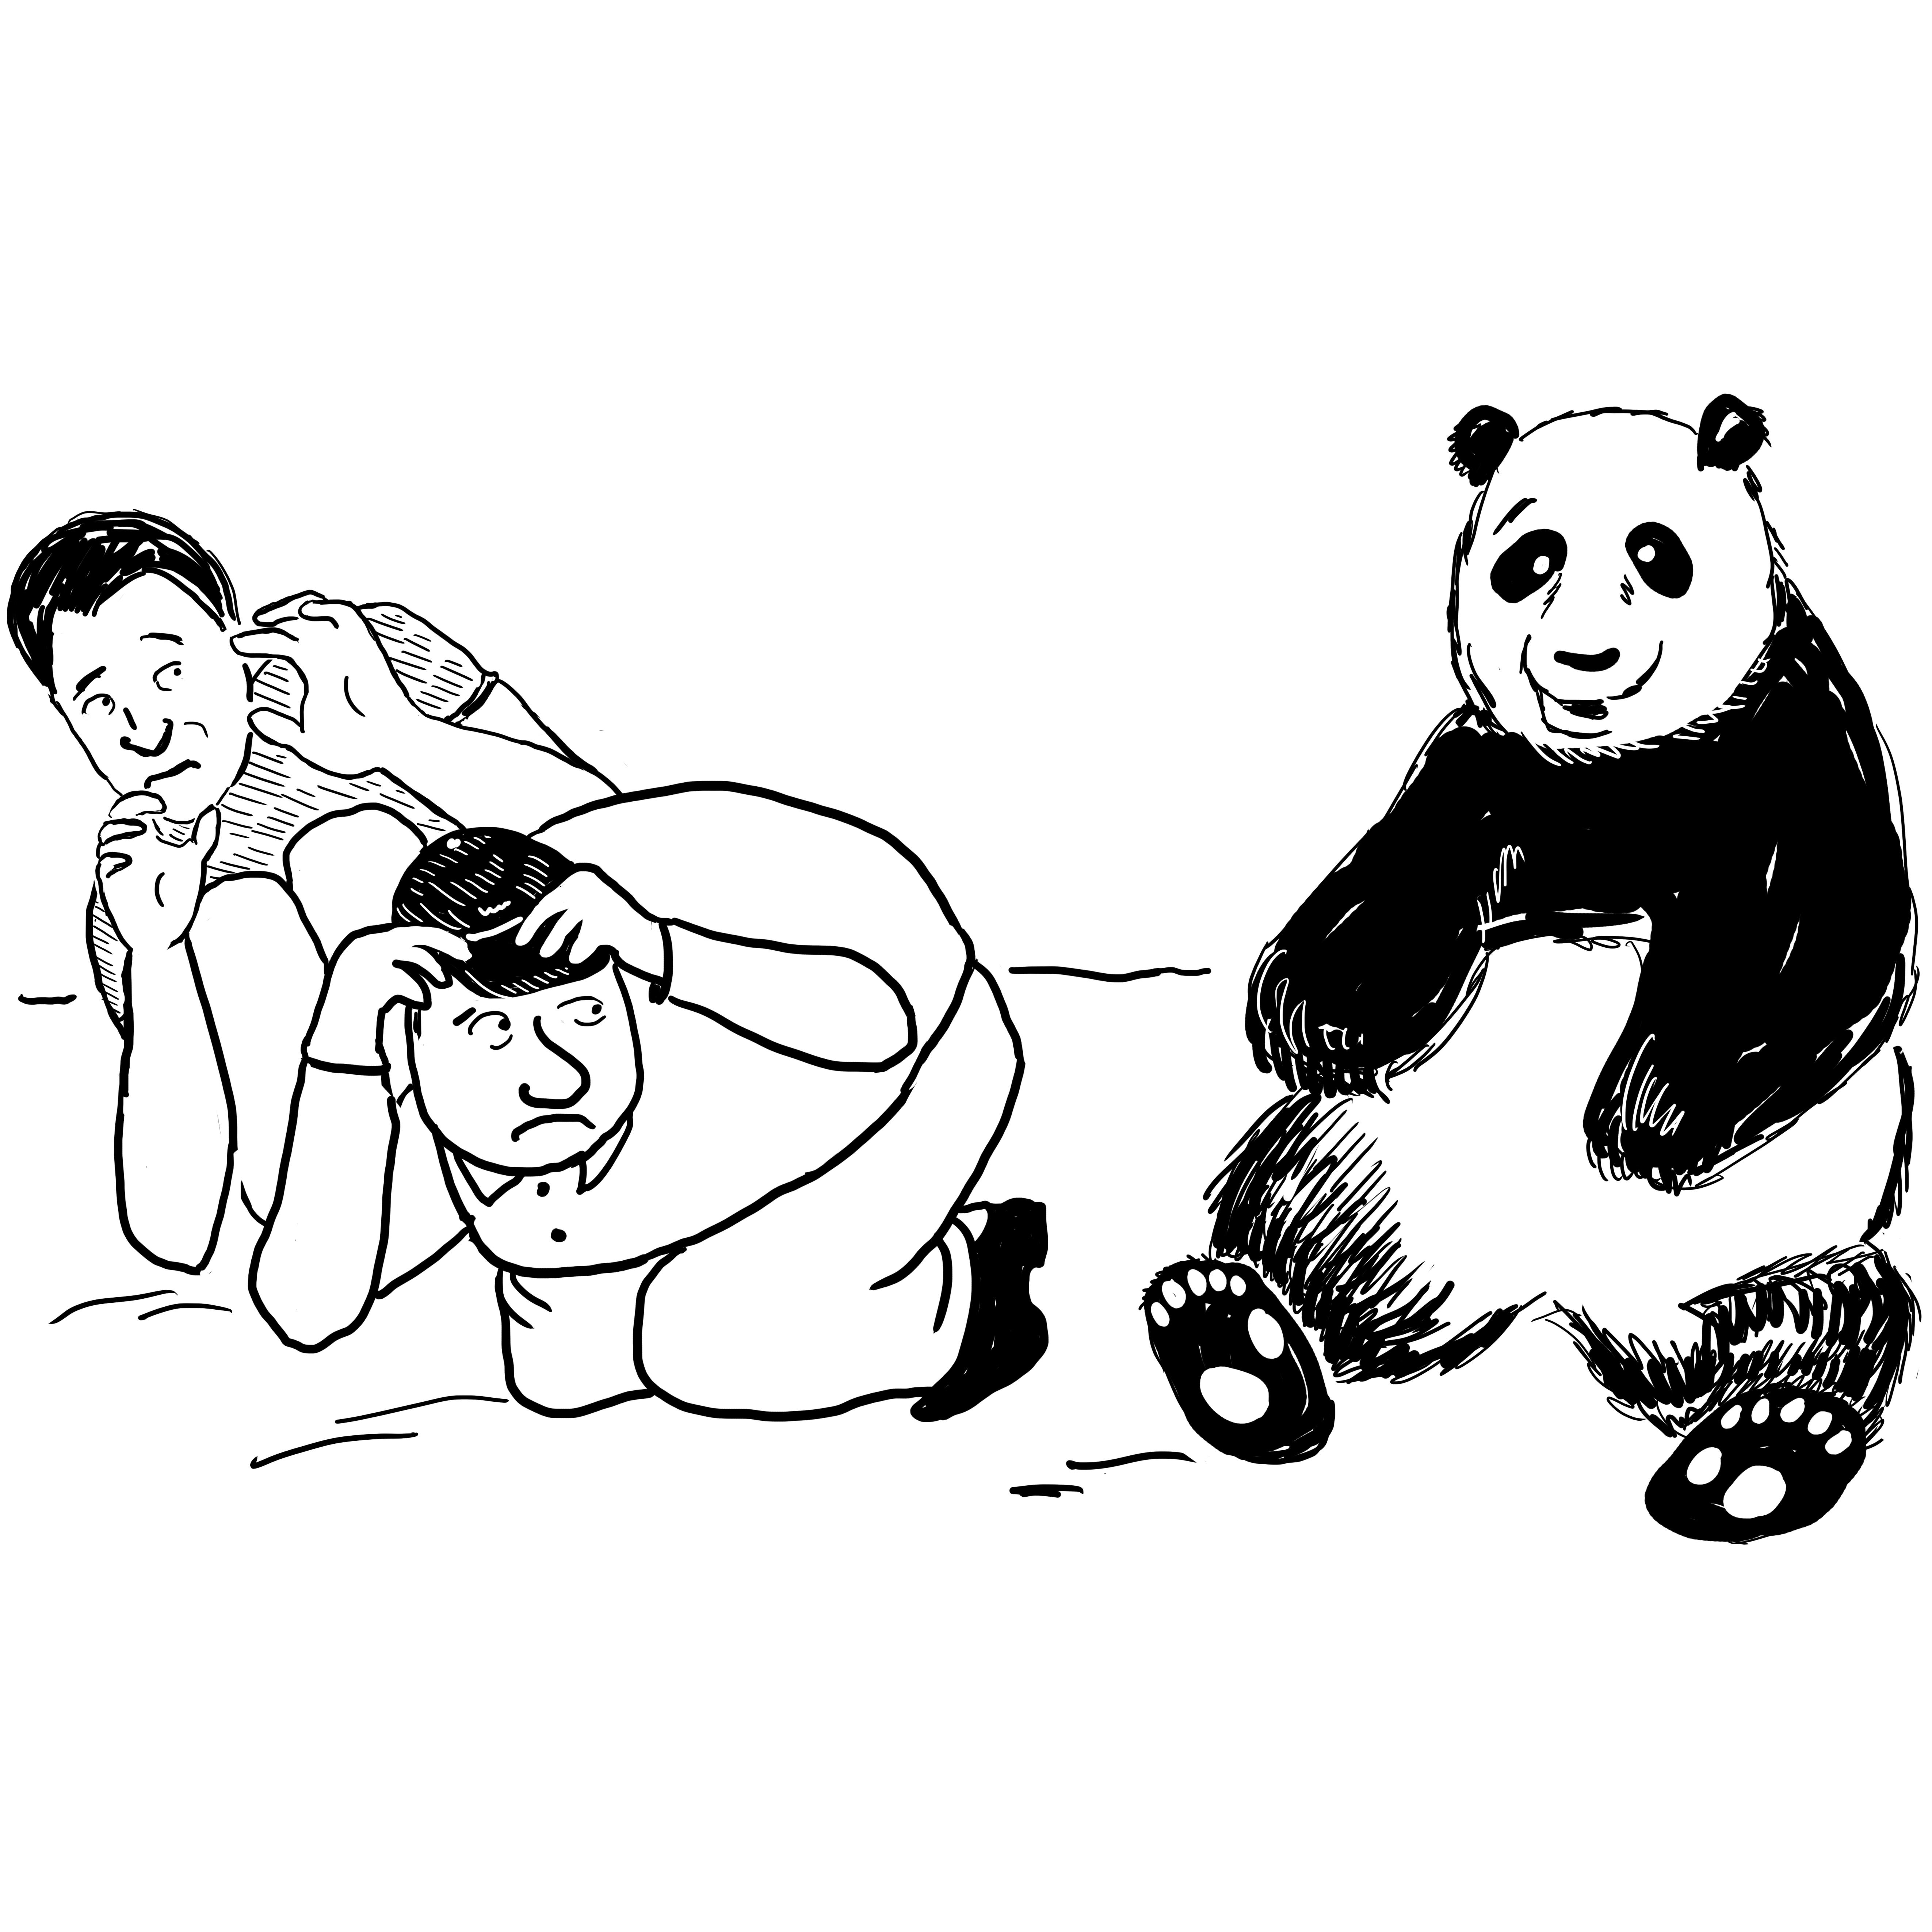 New poll: China's scary